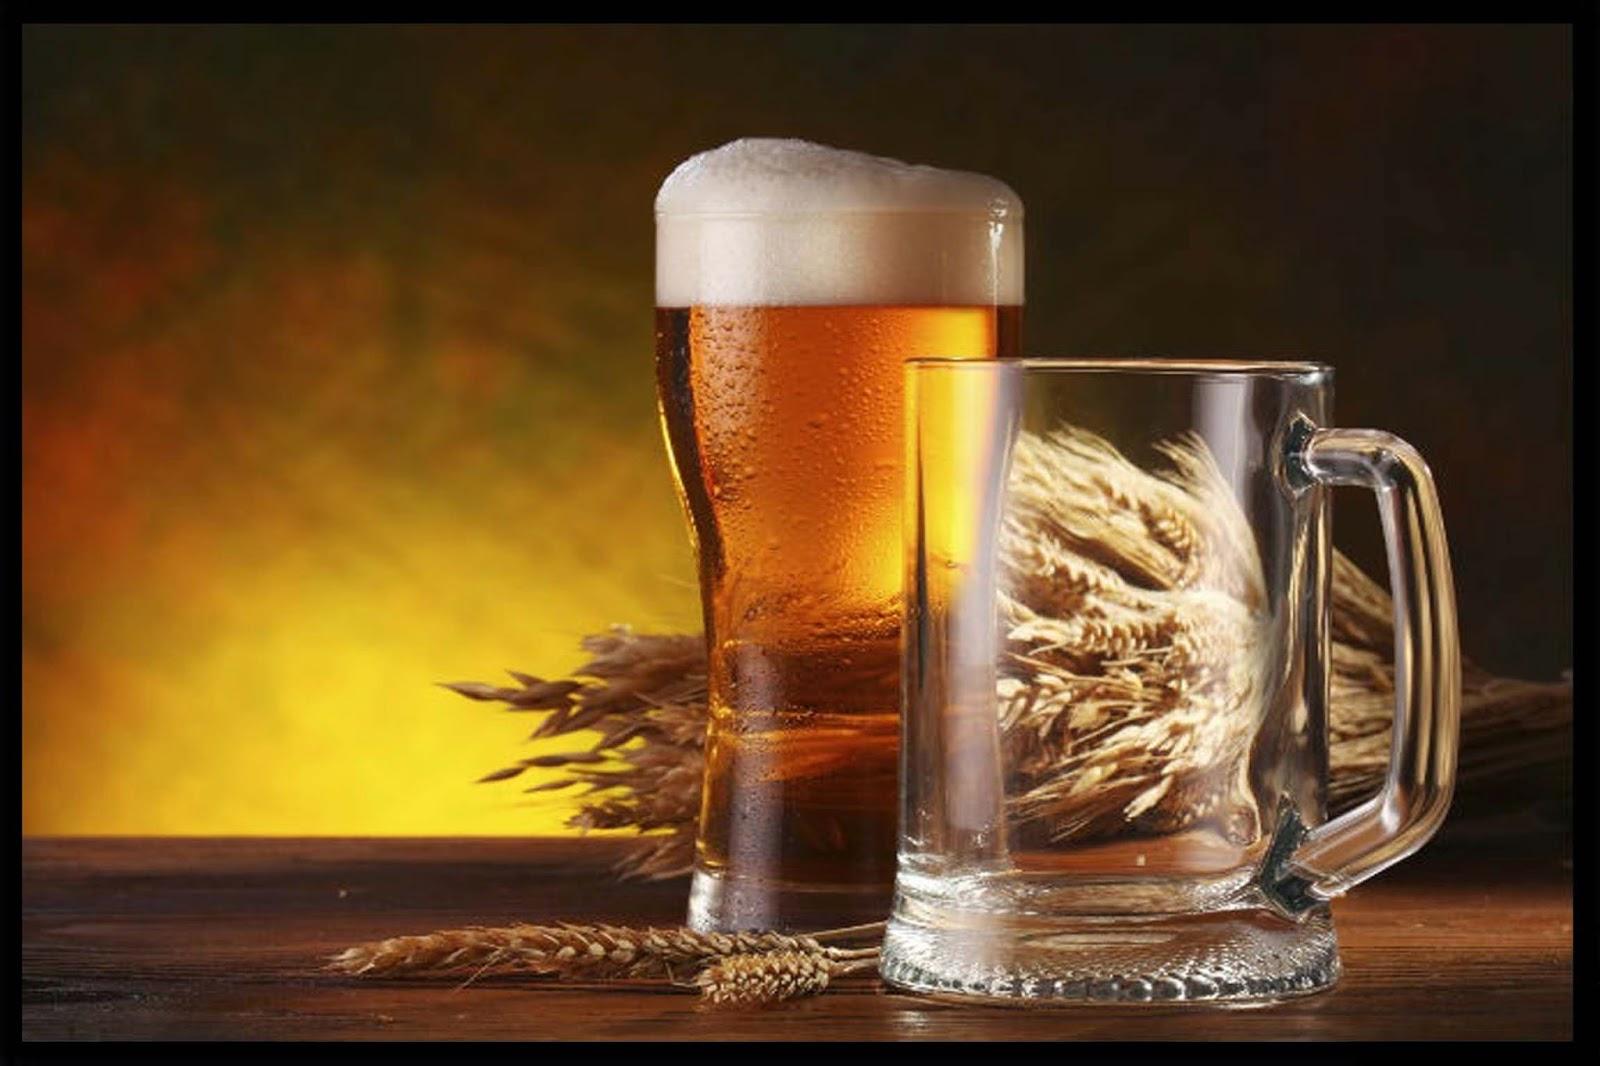 Cerveza Artesanal on Acura Rdx